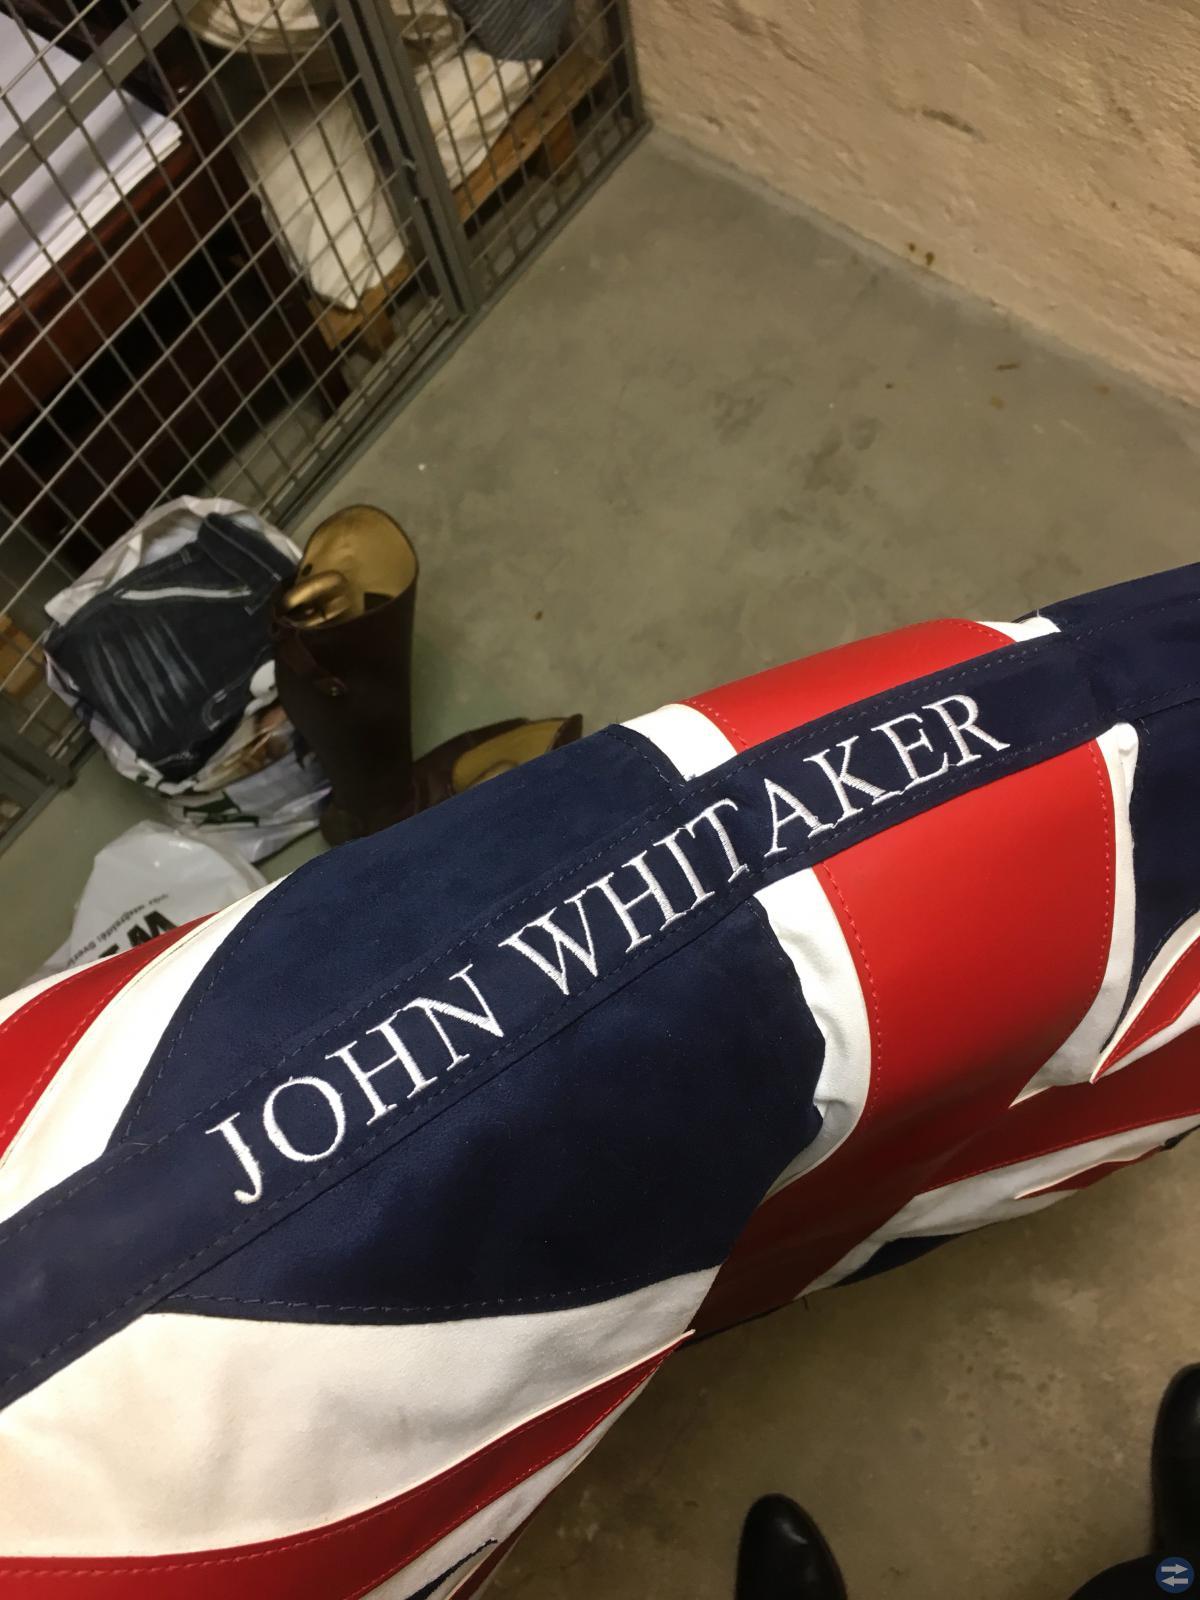 John Whitaker schabrak